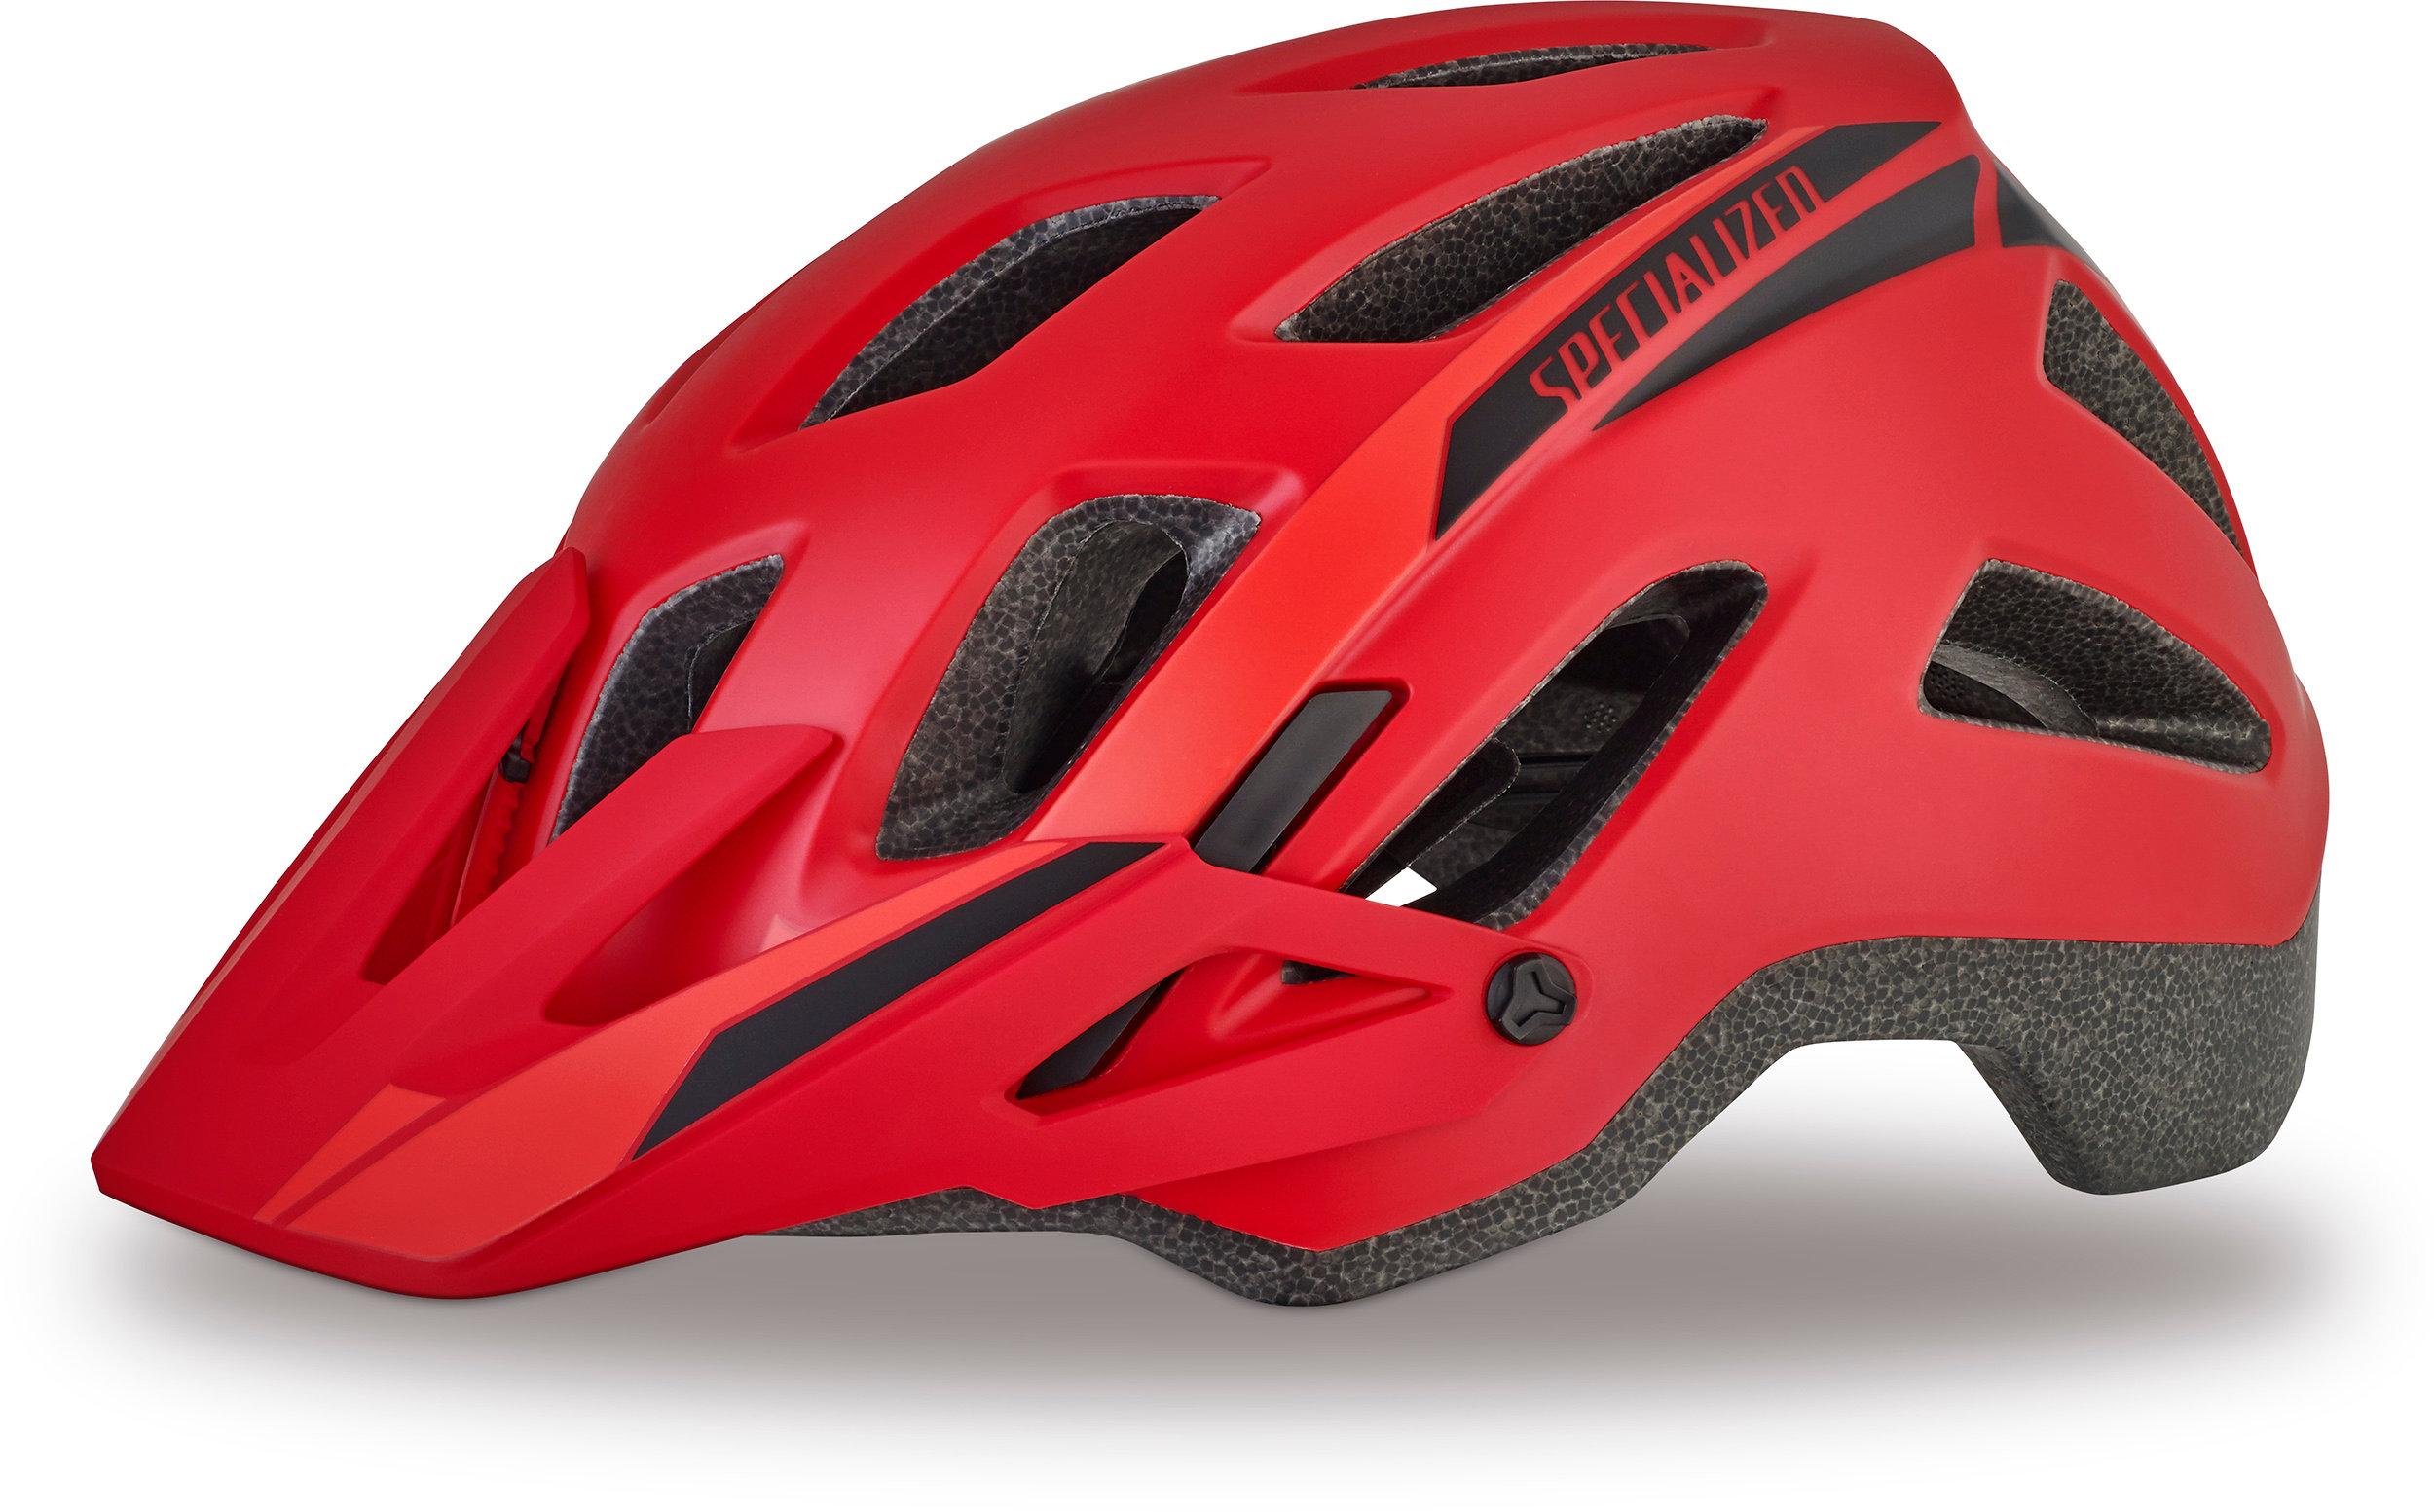 SPECIALIZED AMBUSH COMP HLMT CE RED M - Bike Zone